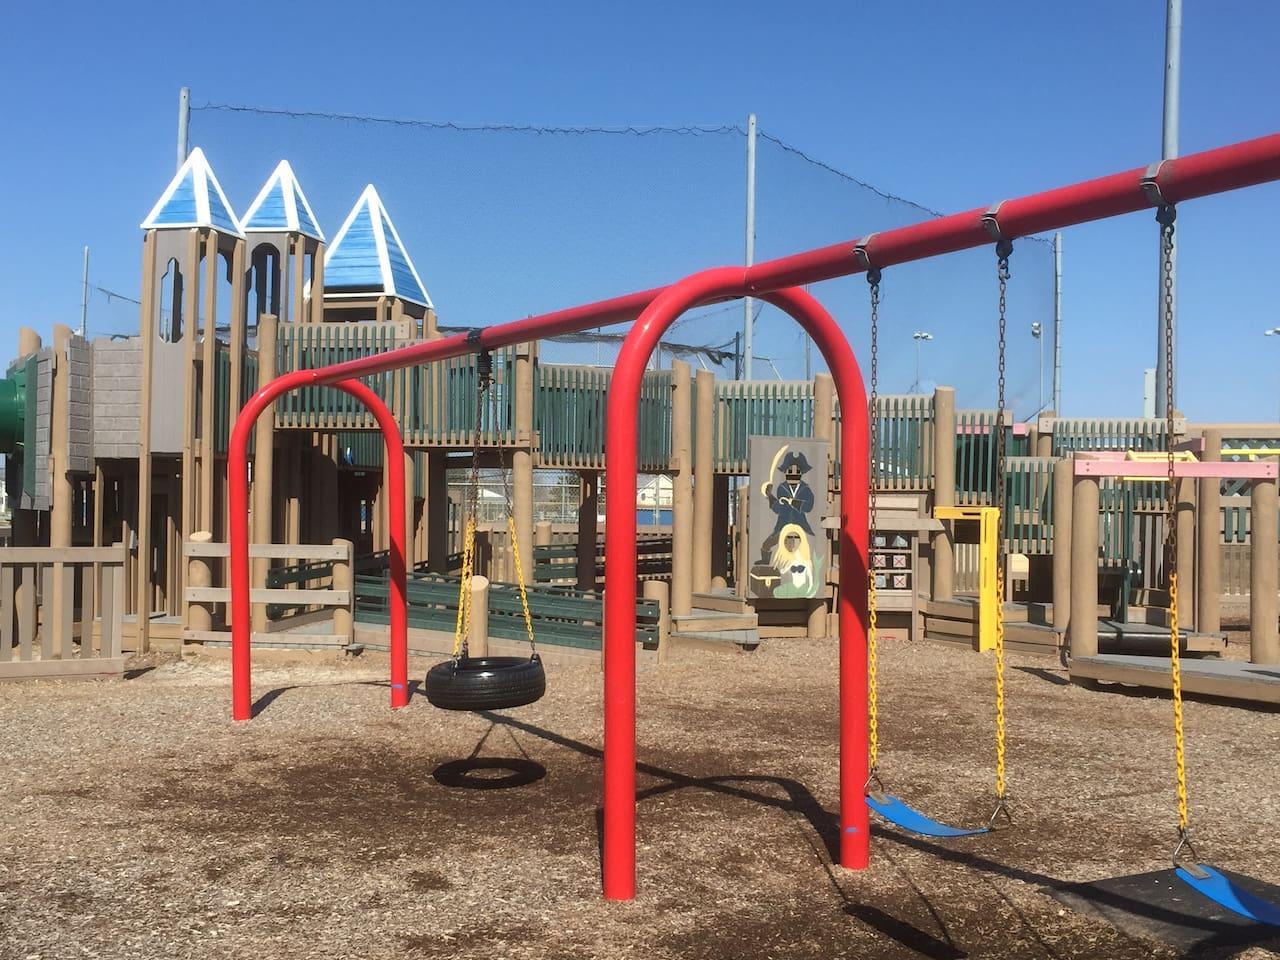 Shark Park Playground - Free and Fun!